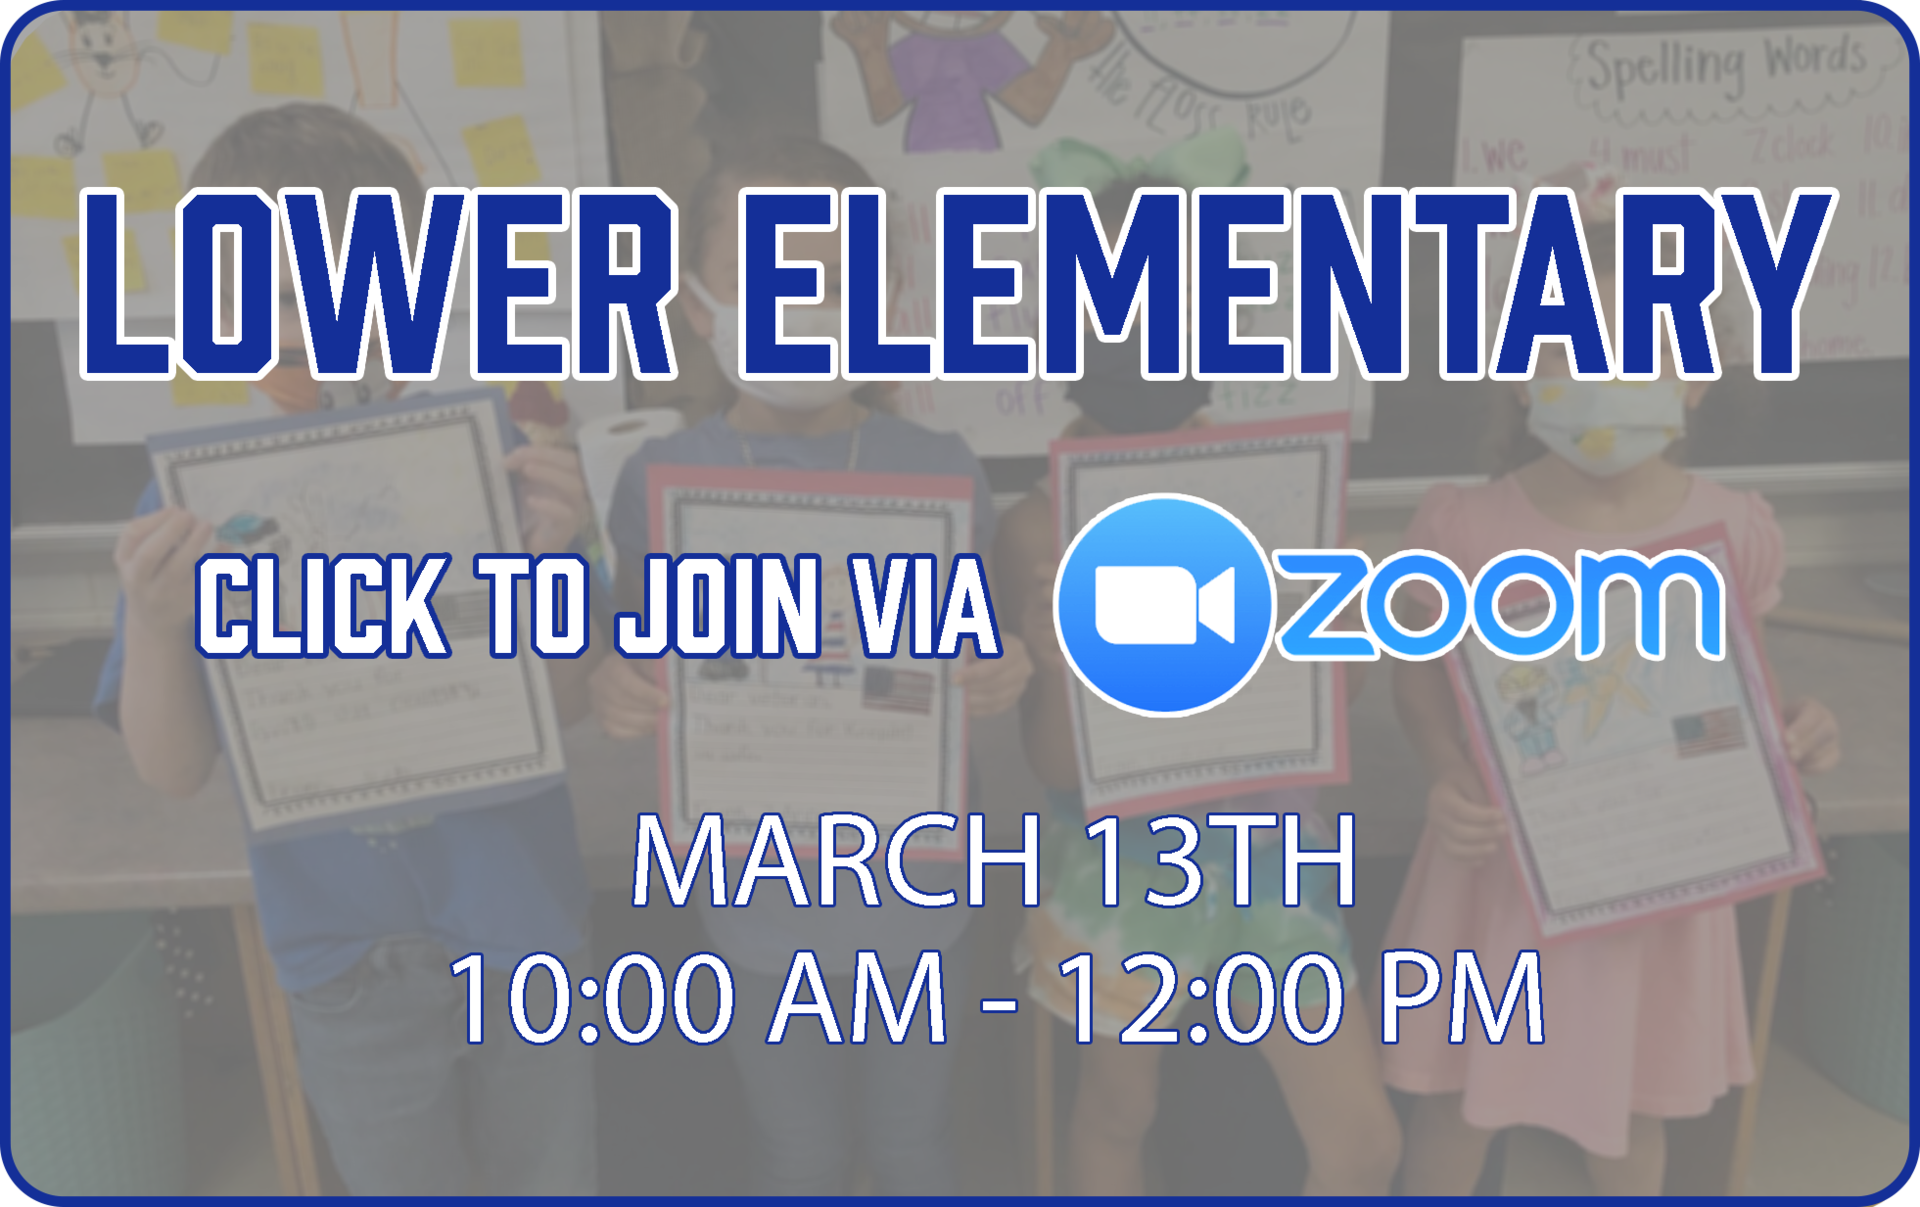 Lower Elementary Zoom Link